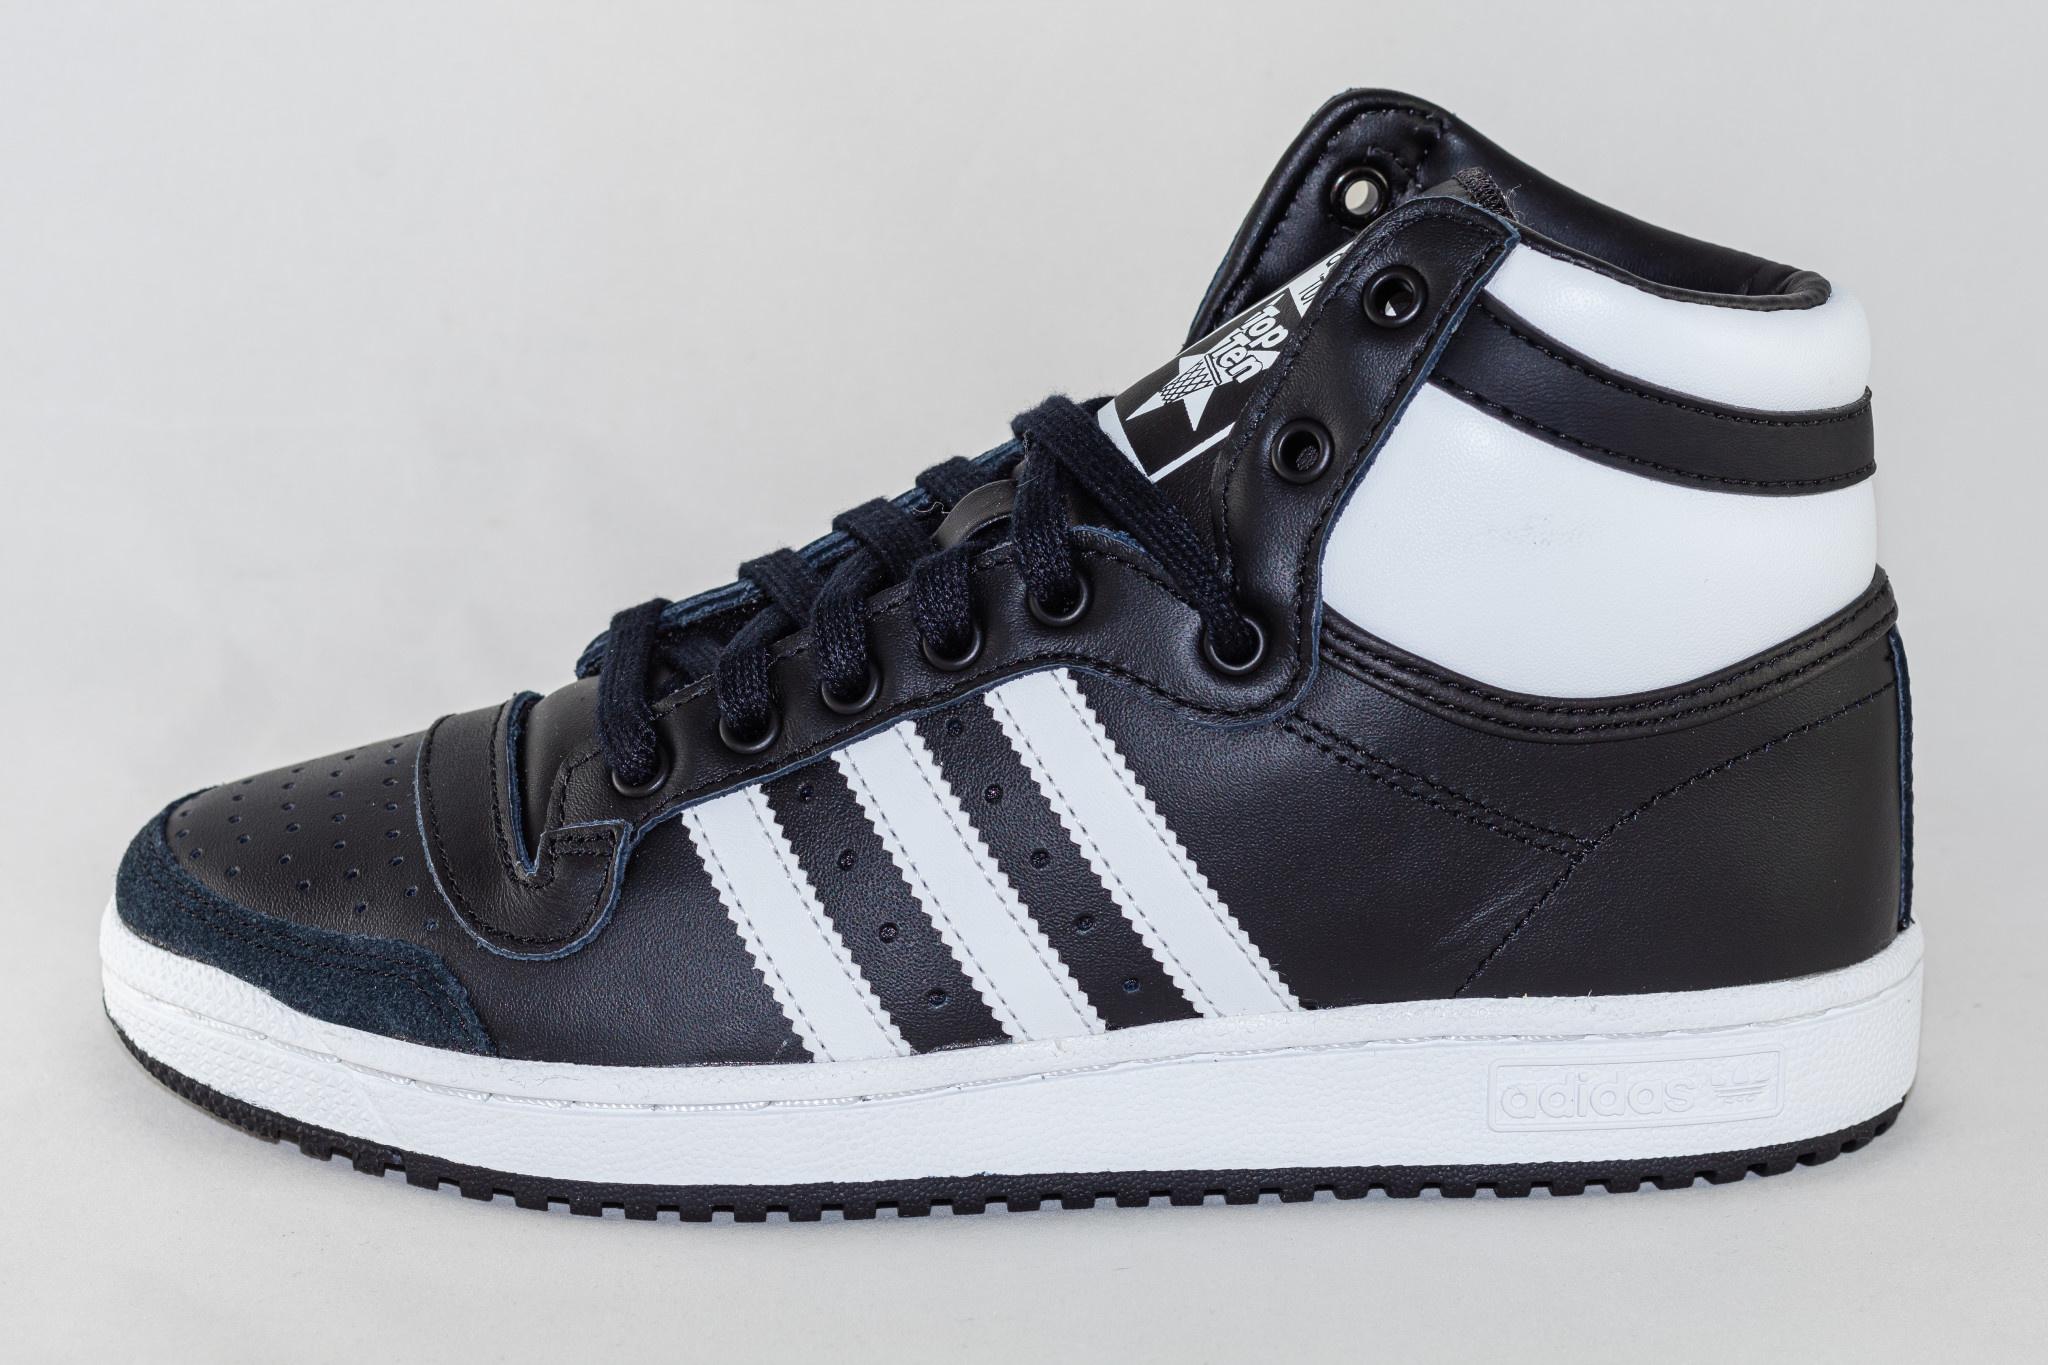 Schuhe adidas Top Ten Hi D65161 NeowhiNnyColred